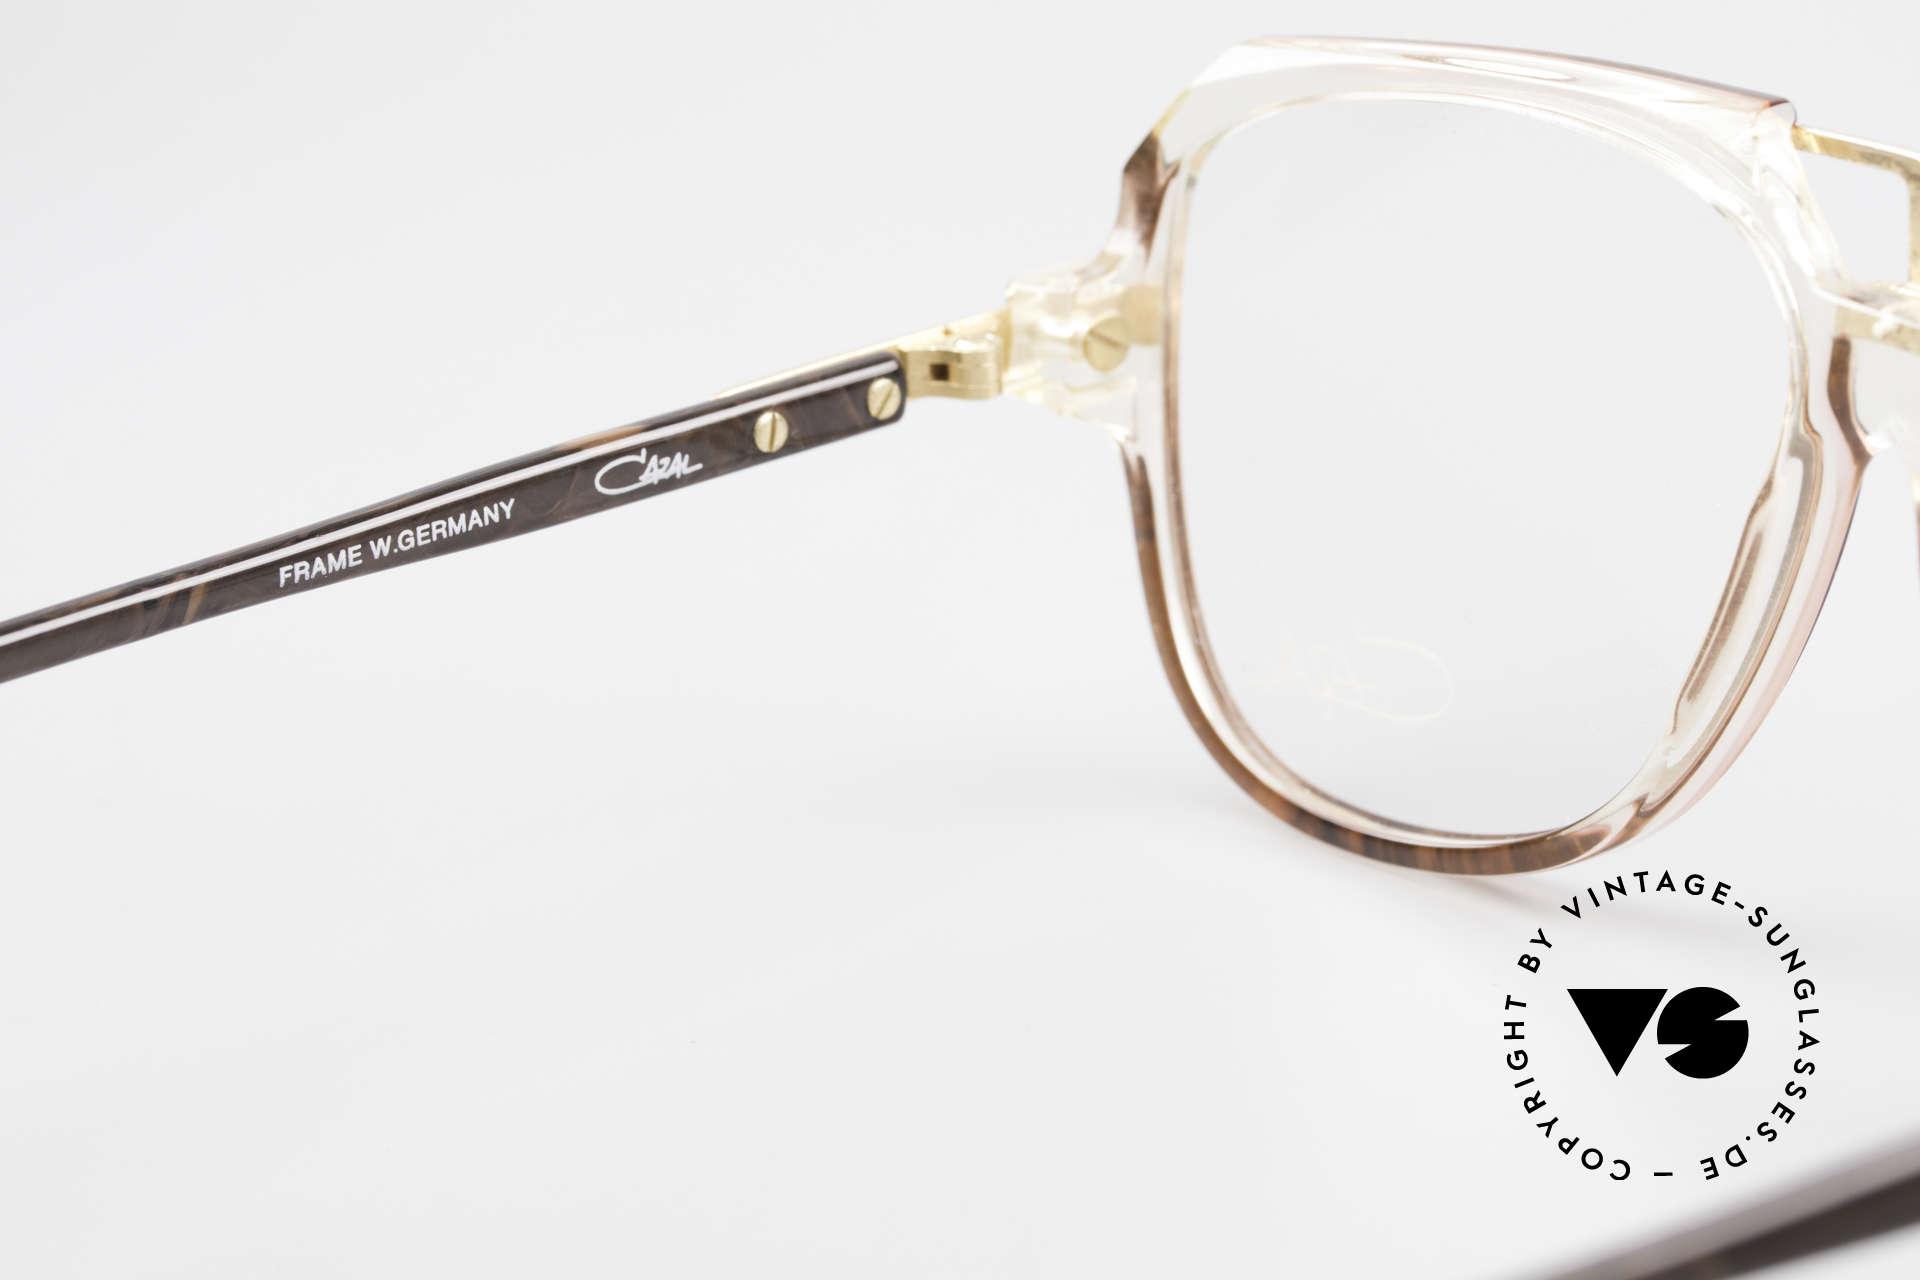 Cazal 636 Old 80's West Germany Cazal, NO RETRO eyewear, but a rare ORIGINAL!, Made for Men